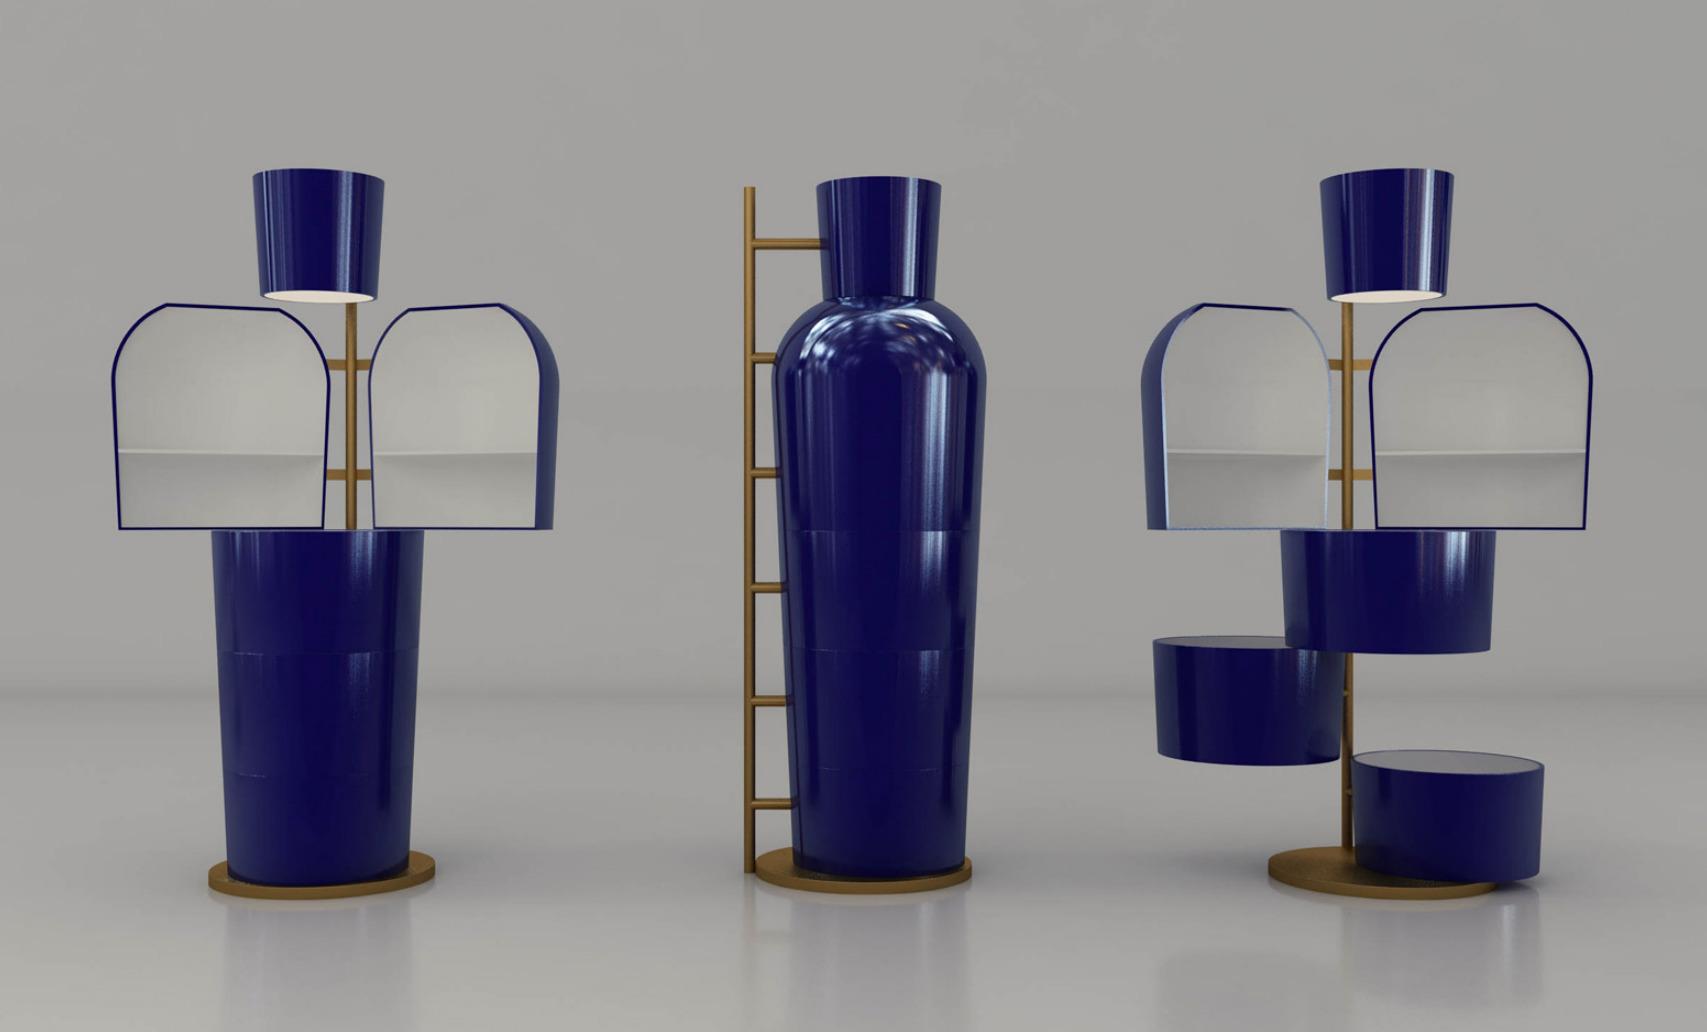 Chinese vase. Shanghai-based St - rachelmauricio | ello